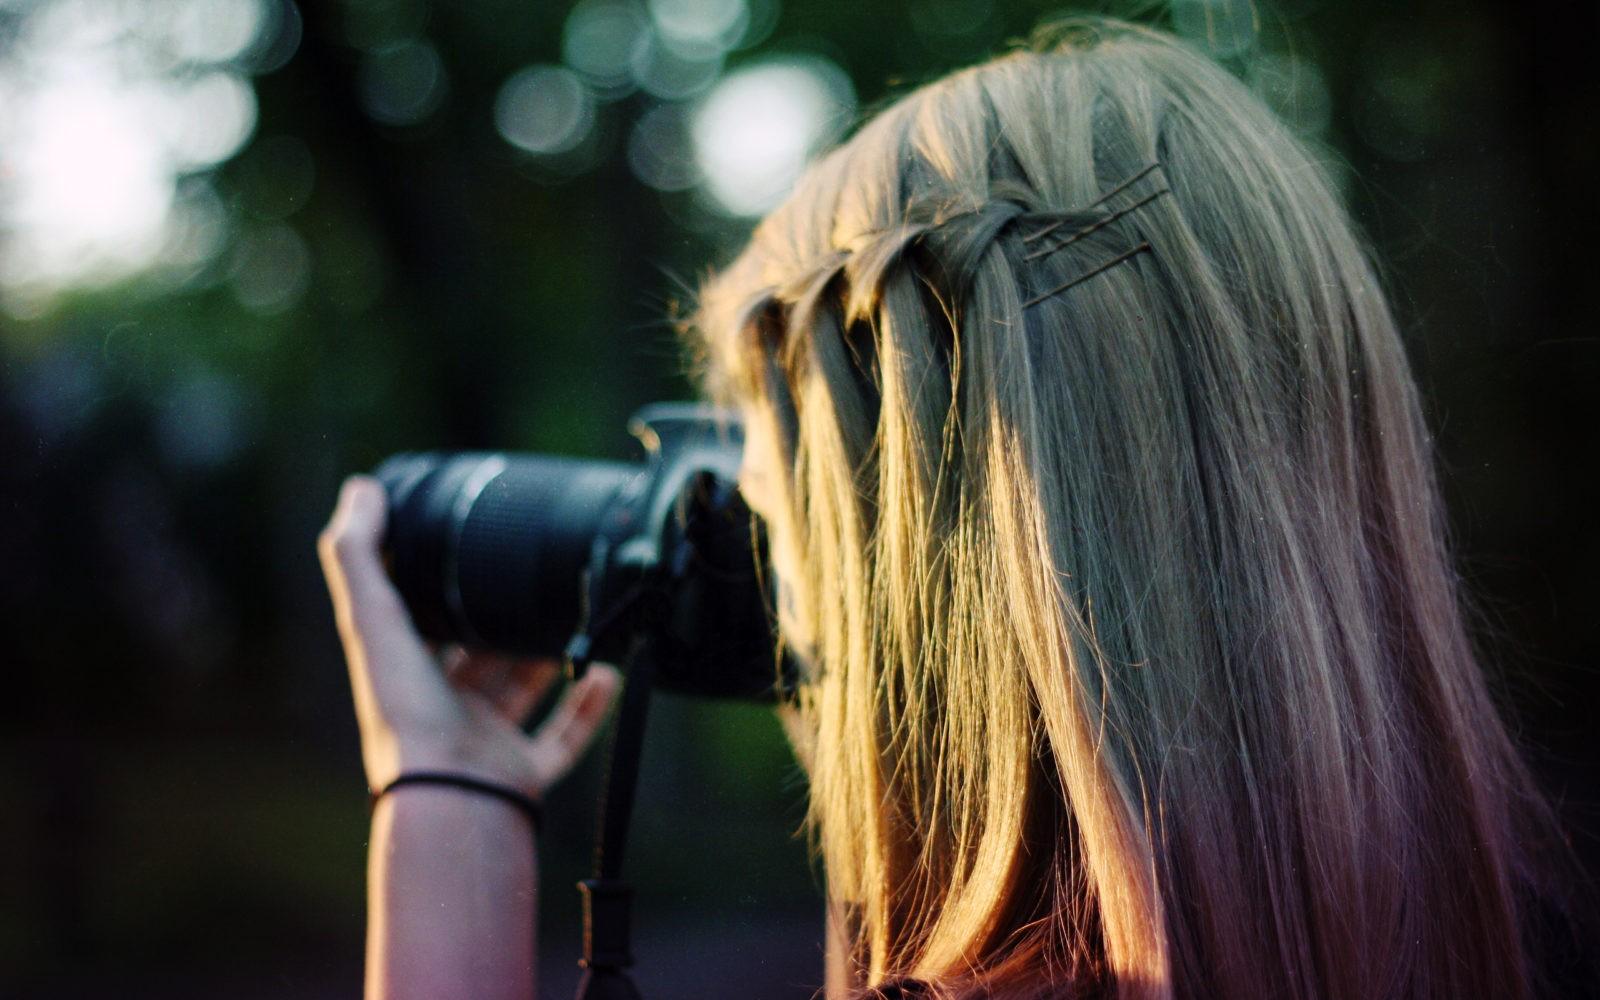 Девушка фотографирует 14